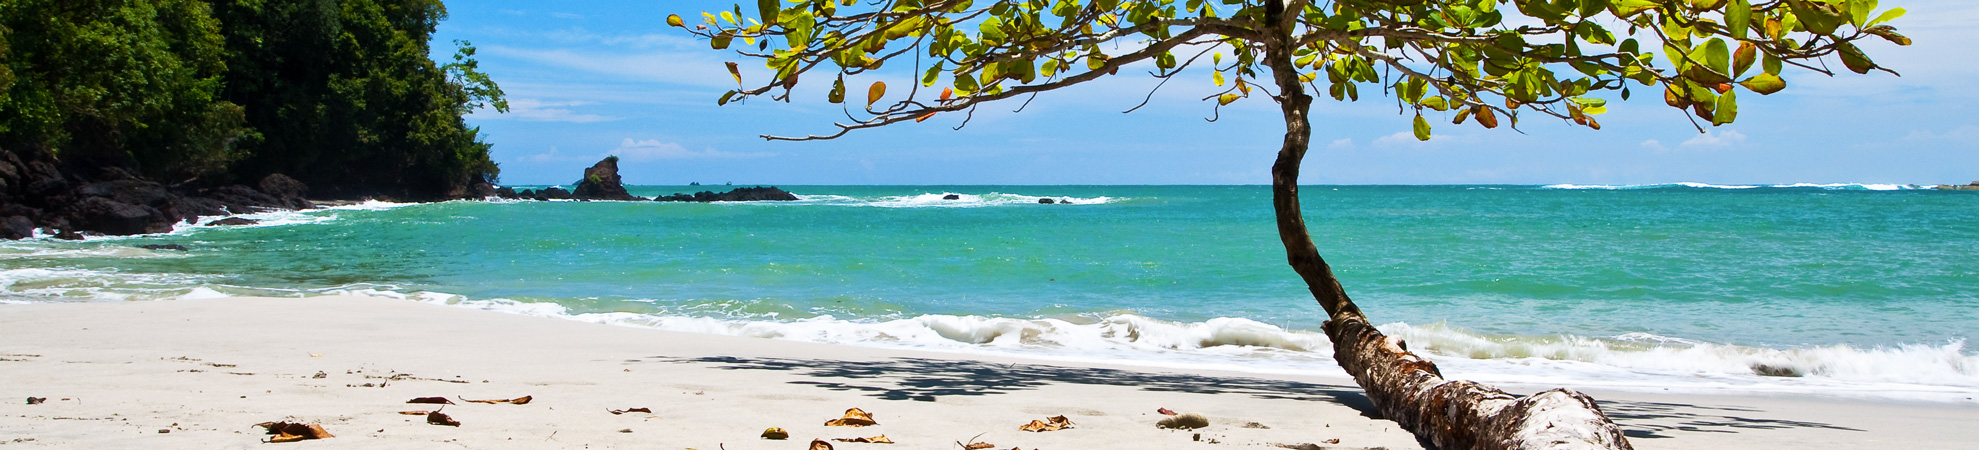 Aller au Costa Rica pour pas cher